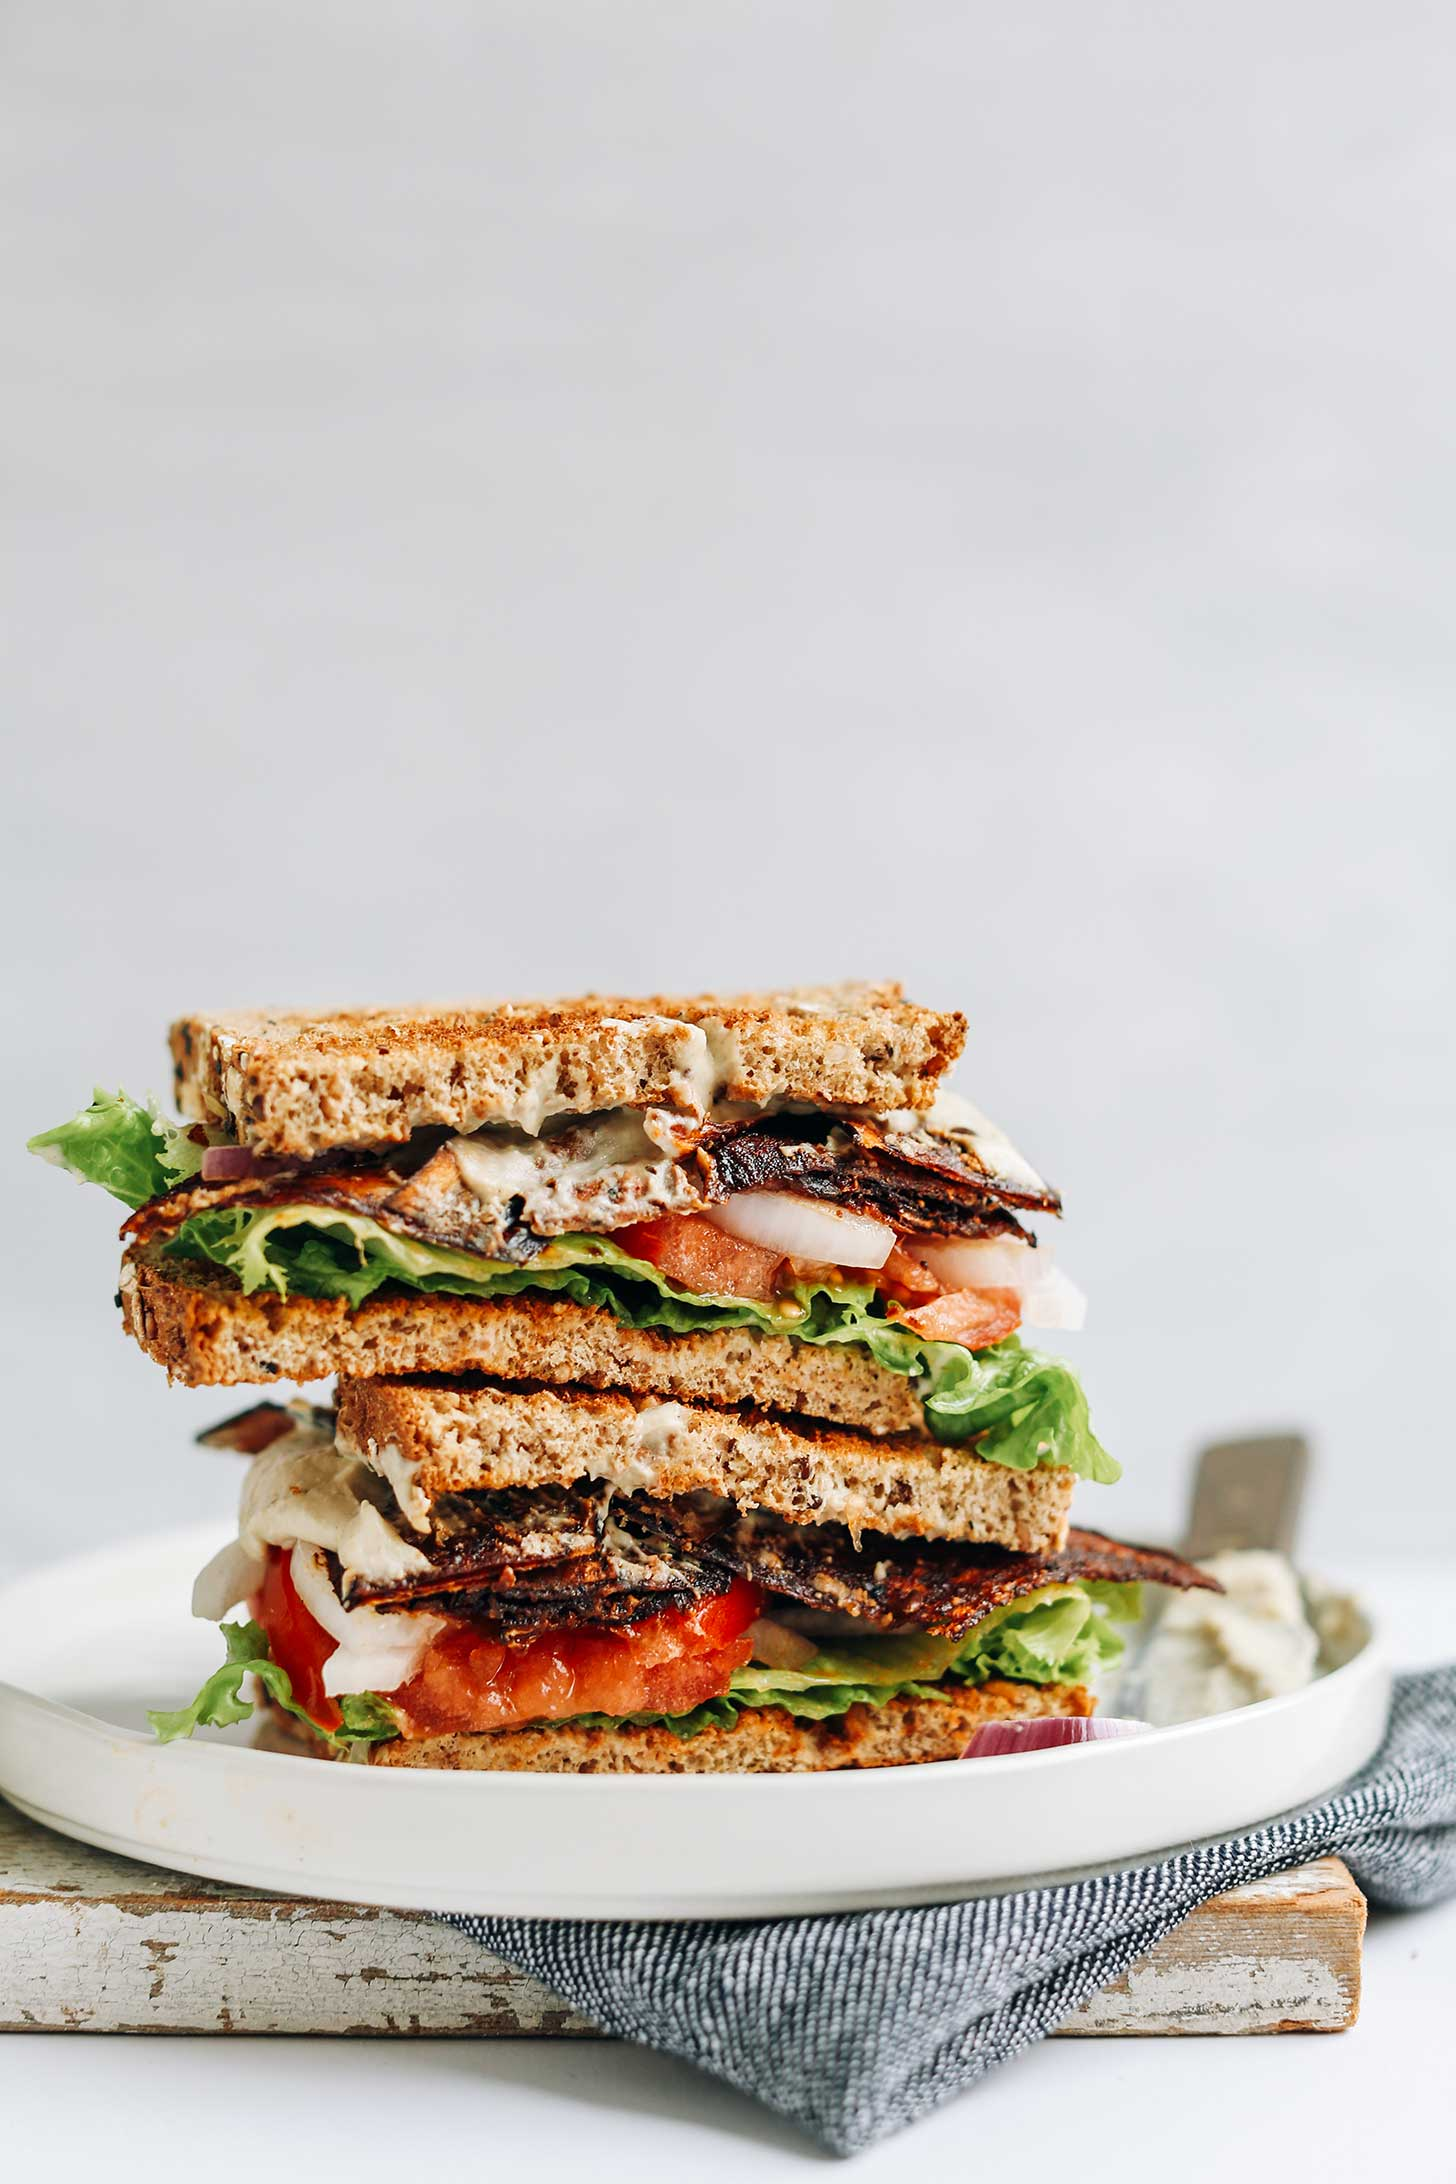 Stacked Vegan BLT Sandwich halves for a satisfying vegan lunch